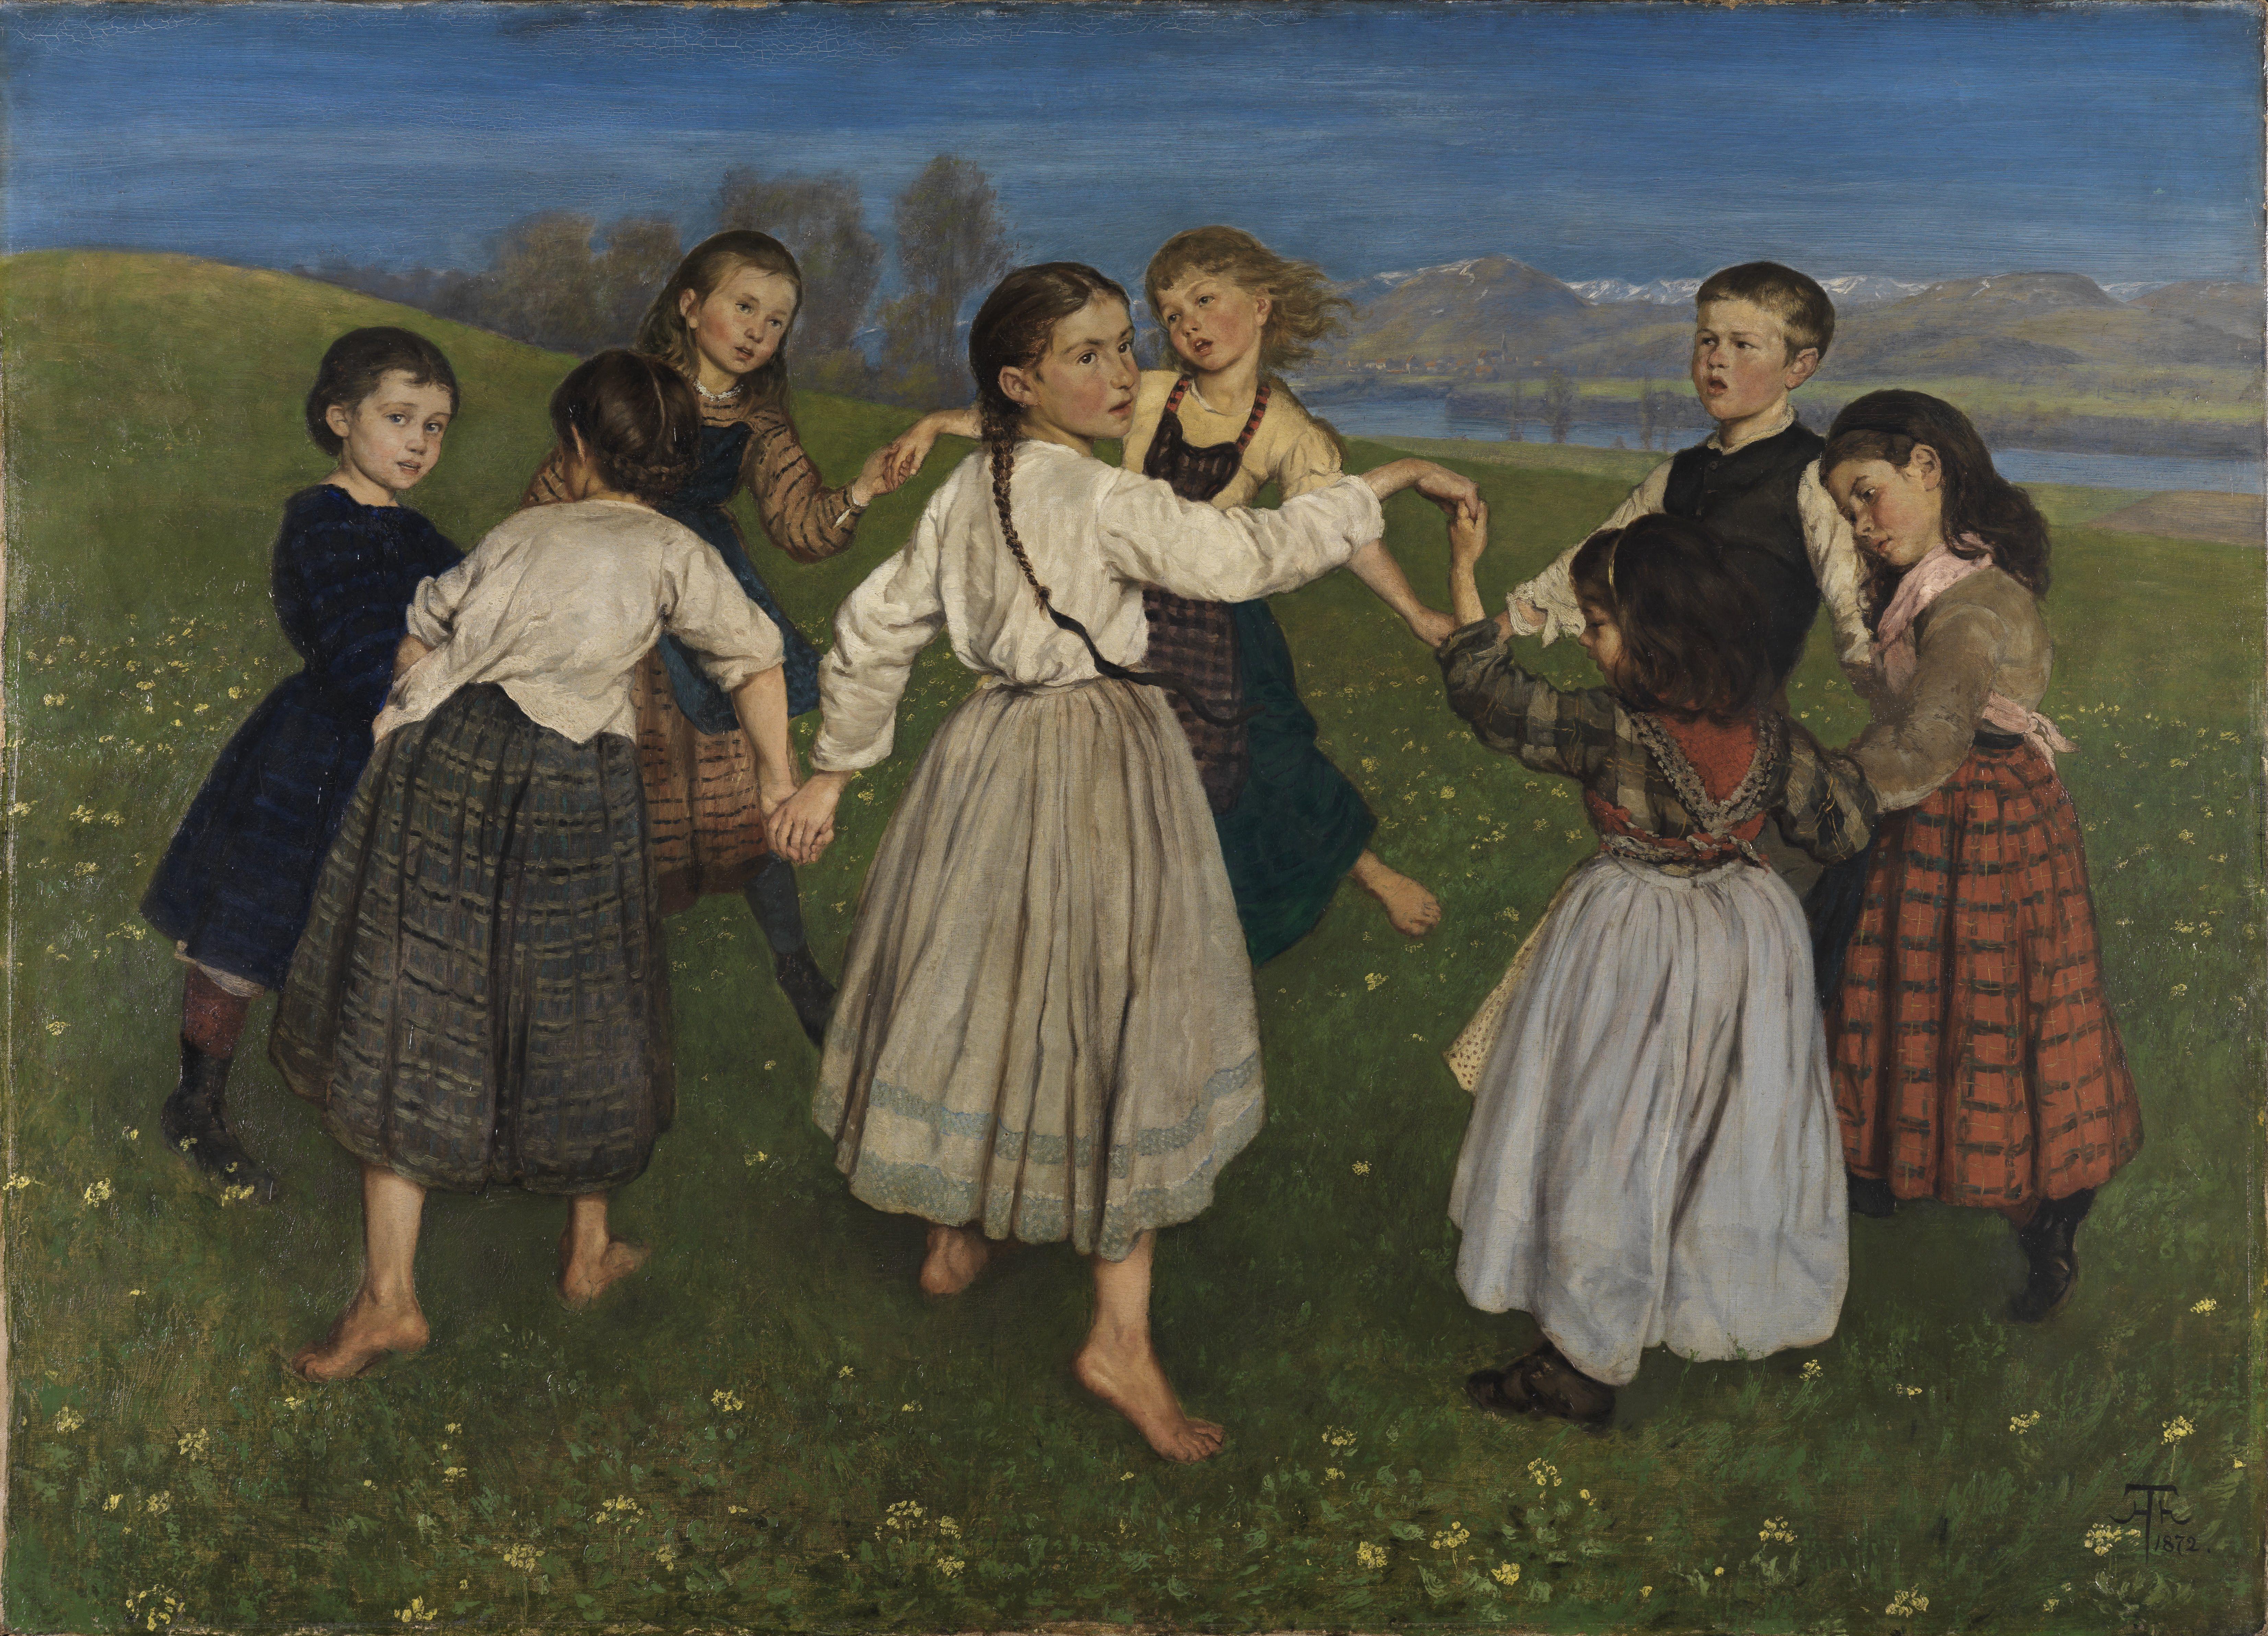 Hans_Thoma_-_Kinderreigen_(1872).jpg